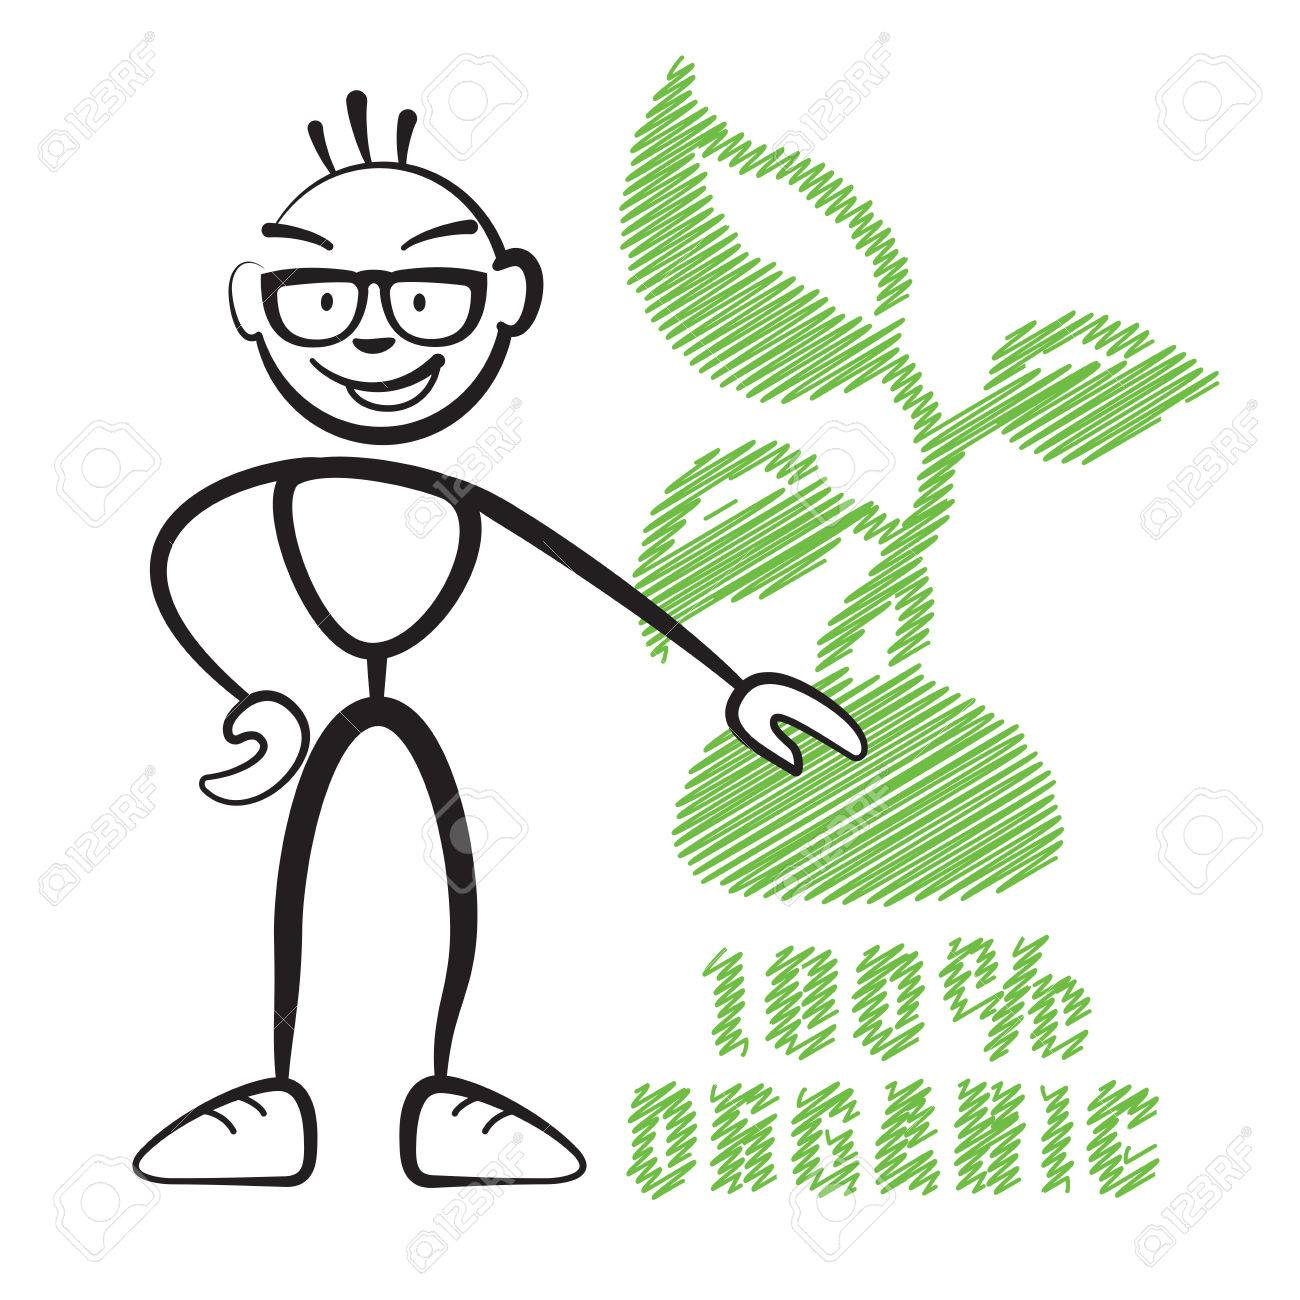 1300x1300 Stick Figure With Symbol 100% Organic, Stickman Vector Drawing